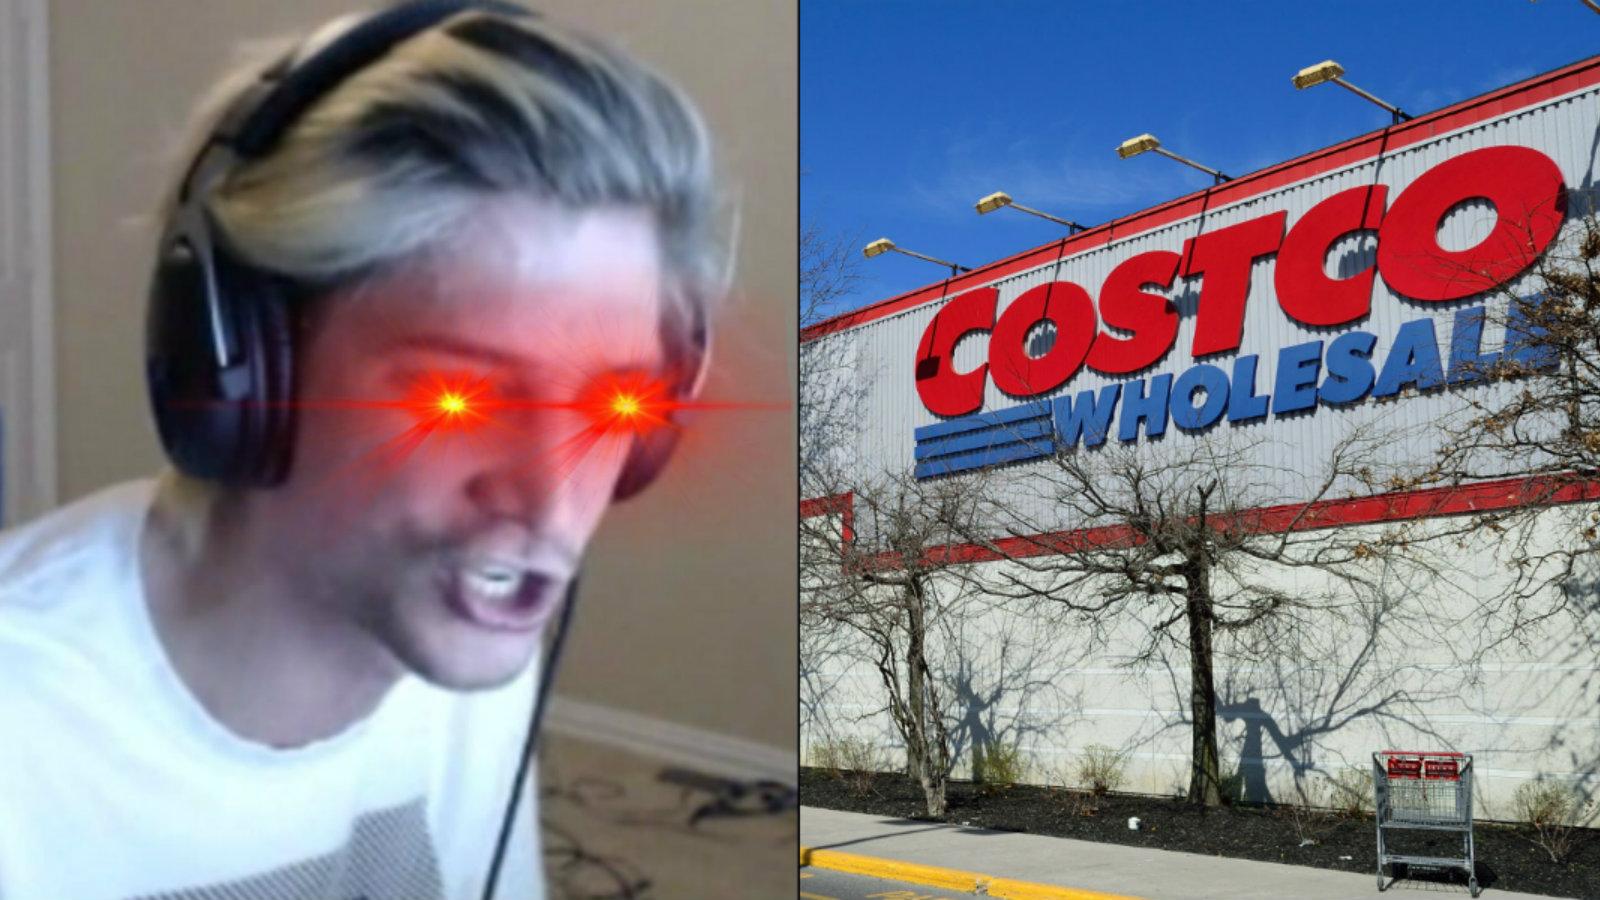 xQc / Costco